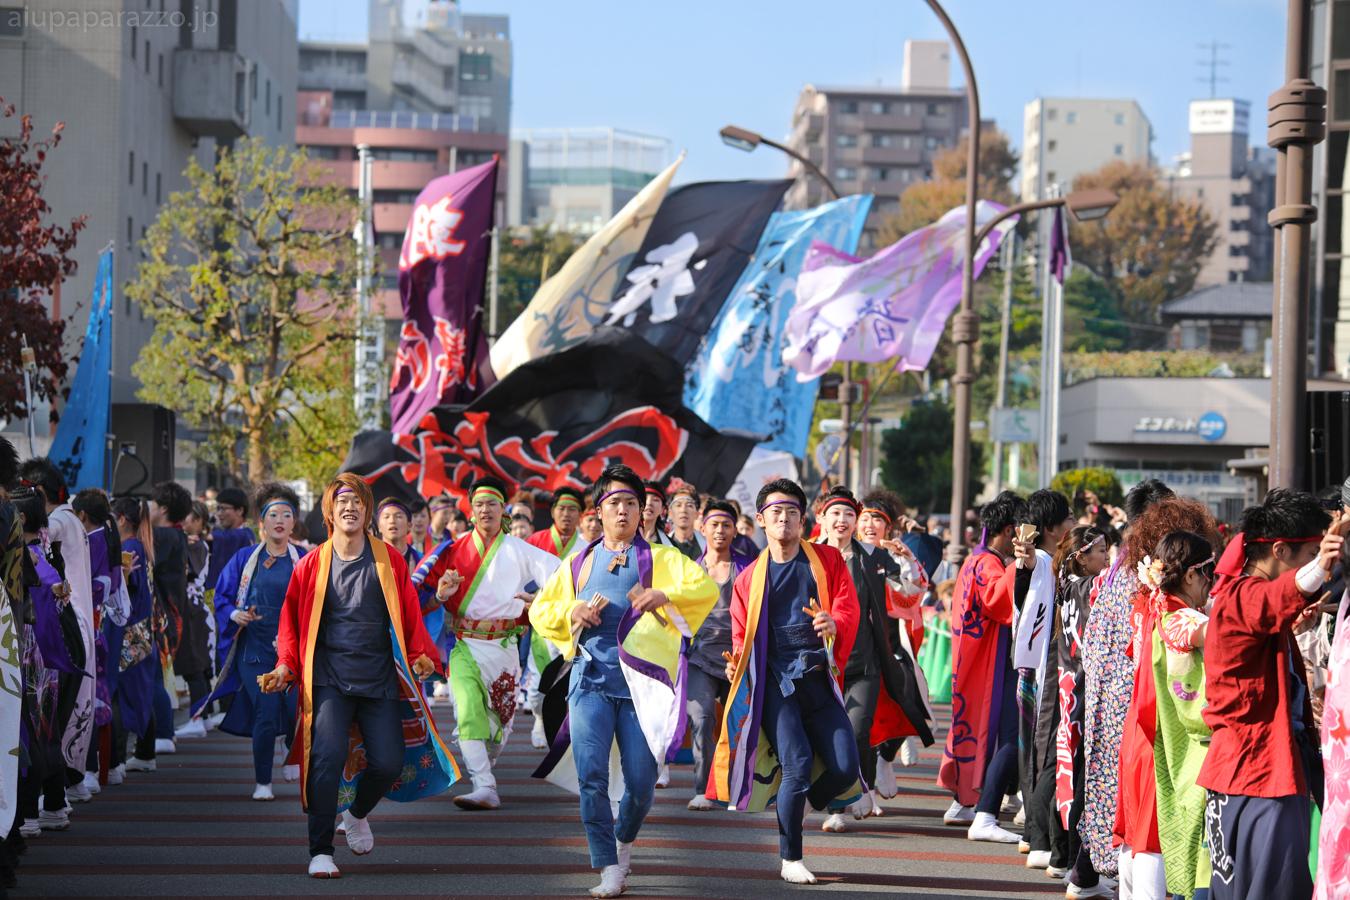 kanpachi2016oyachai-23.jpg